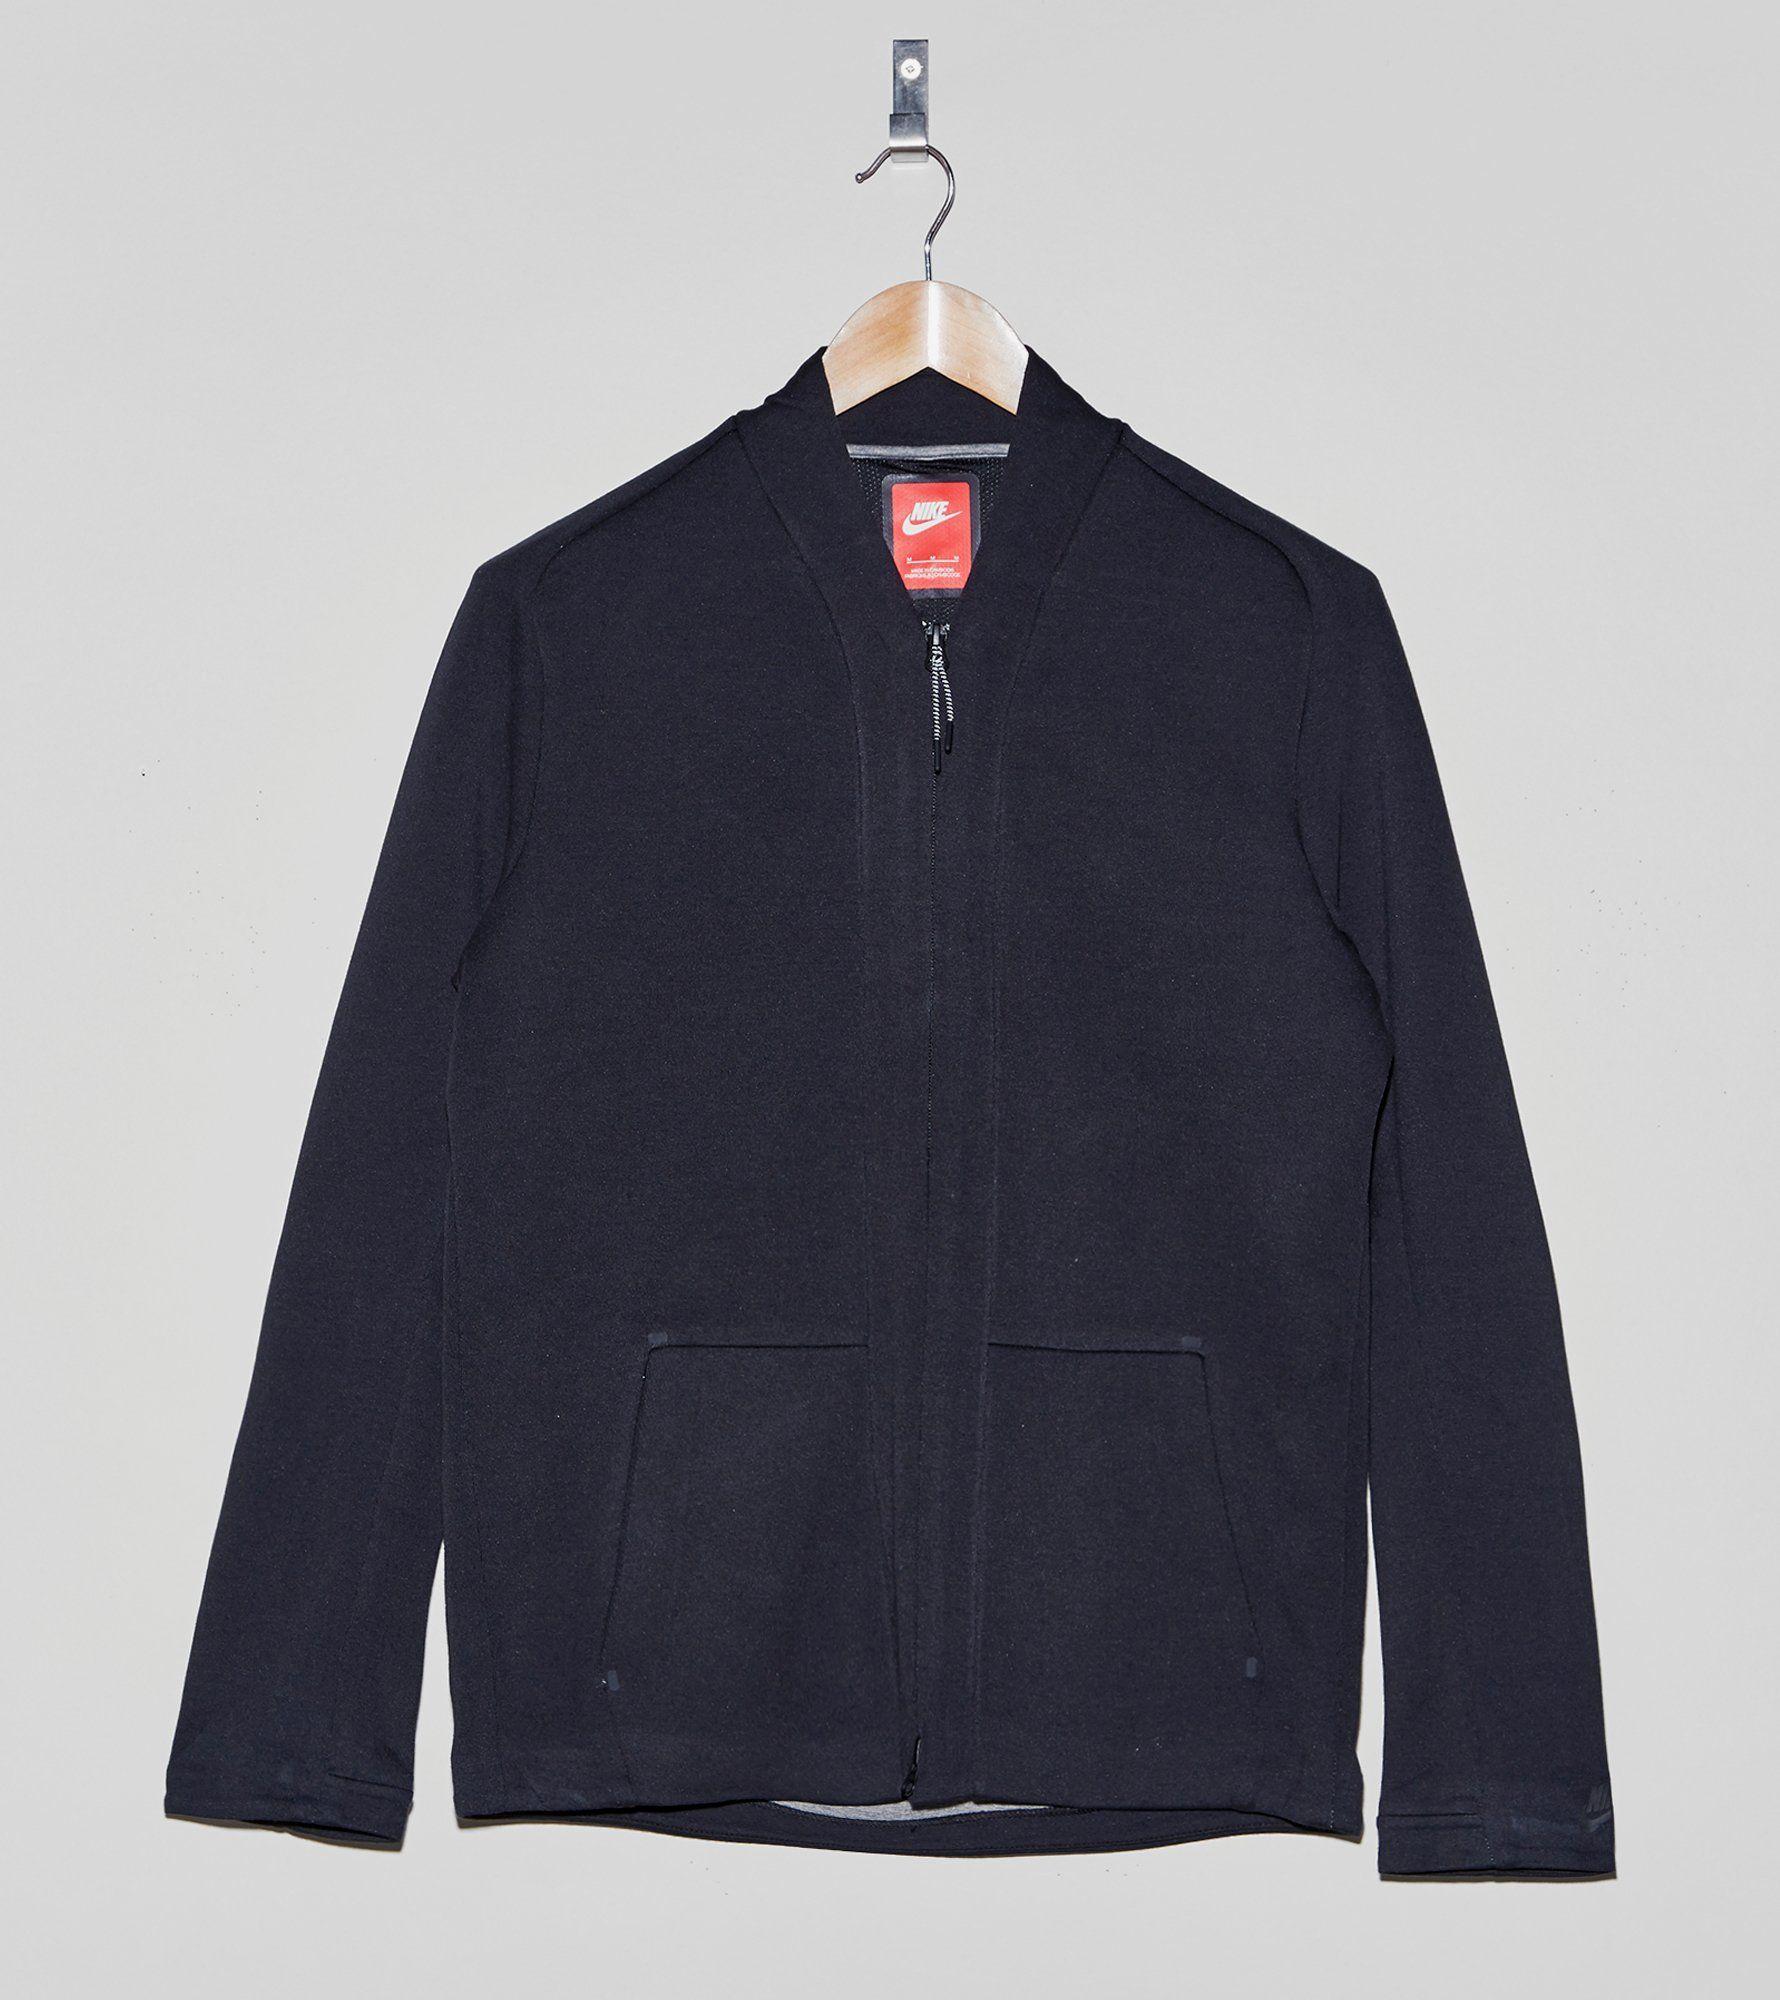 Nike Tech Fleece Cardigan Size? Fleece cardigan, Nike